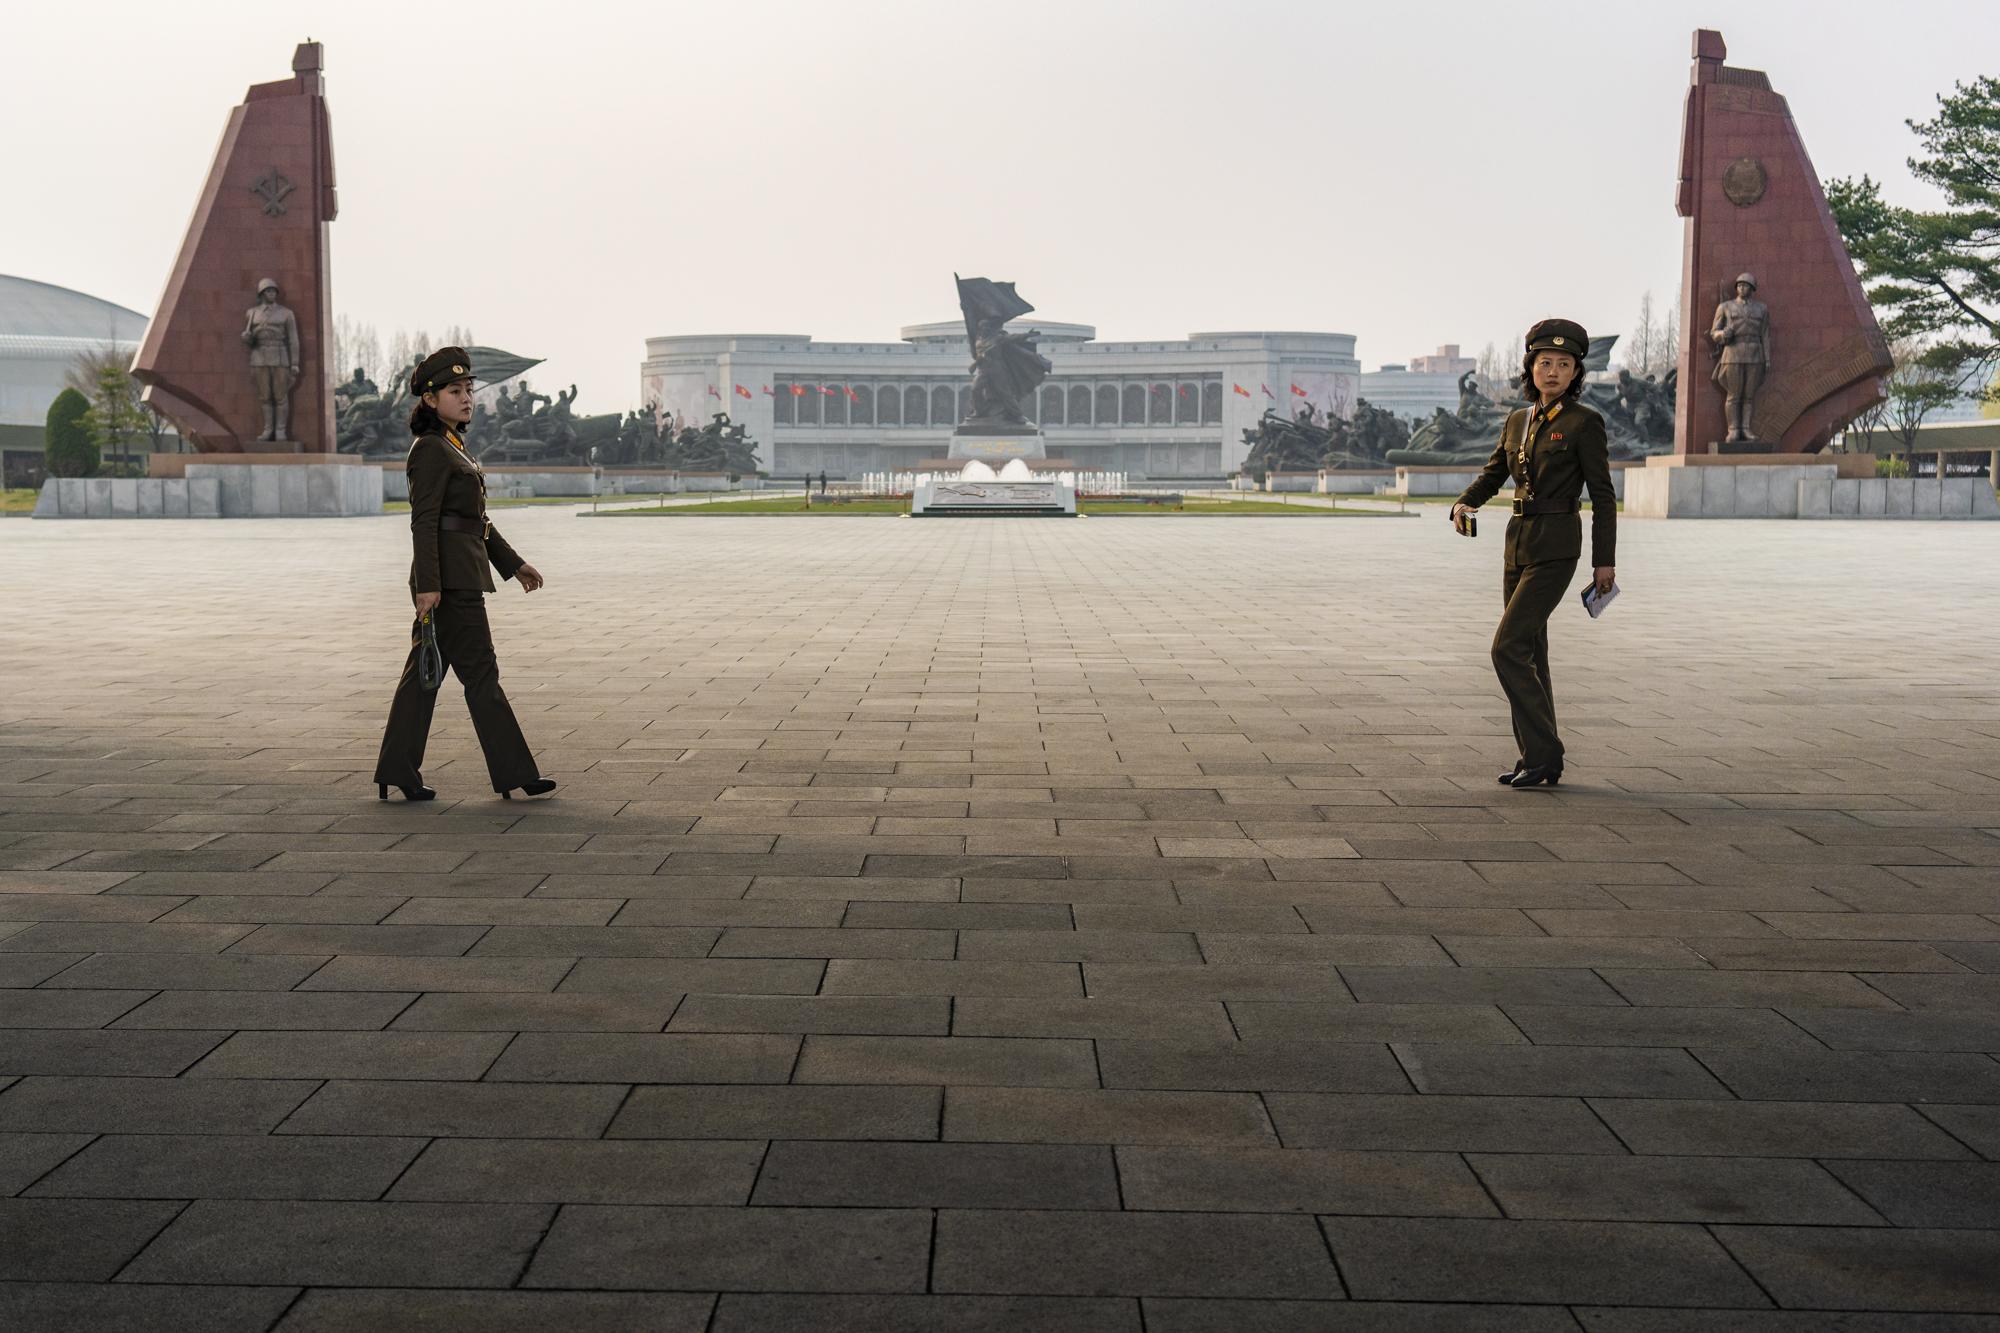 NorthKorea_130419_SNY1324_Web.jpg